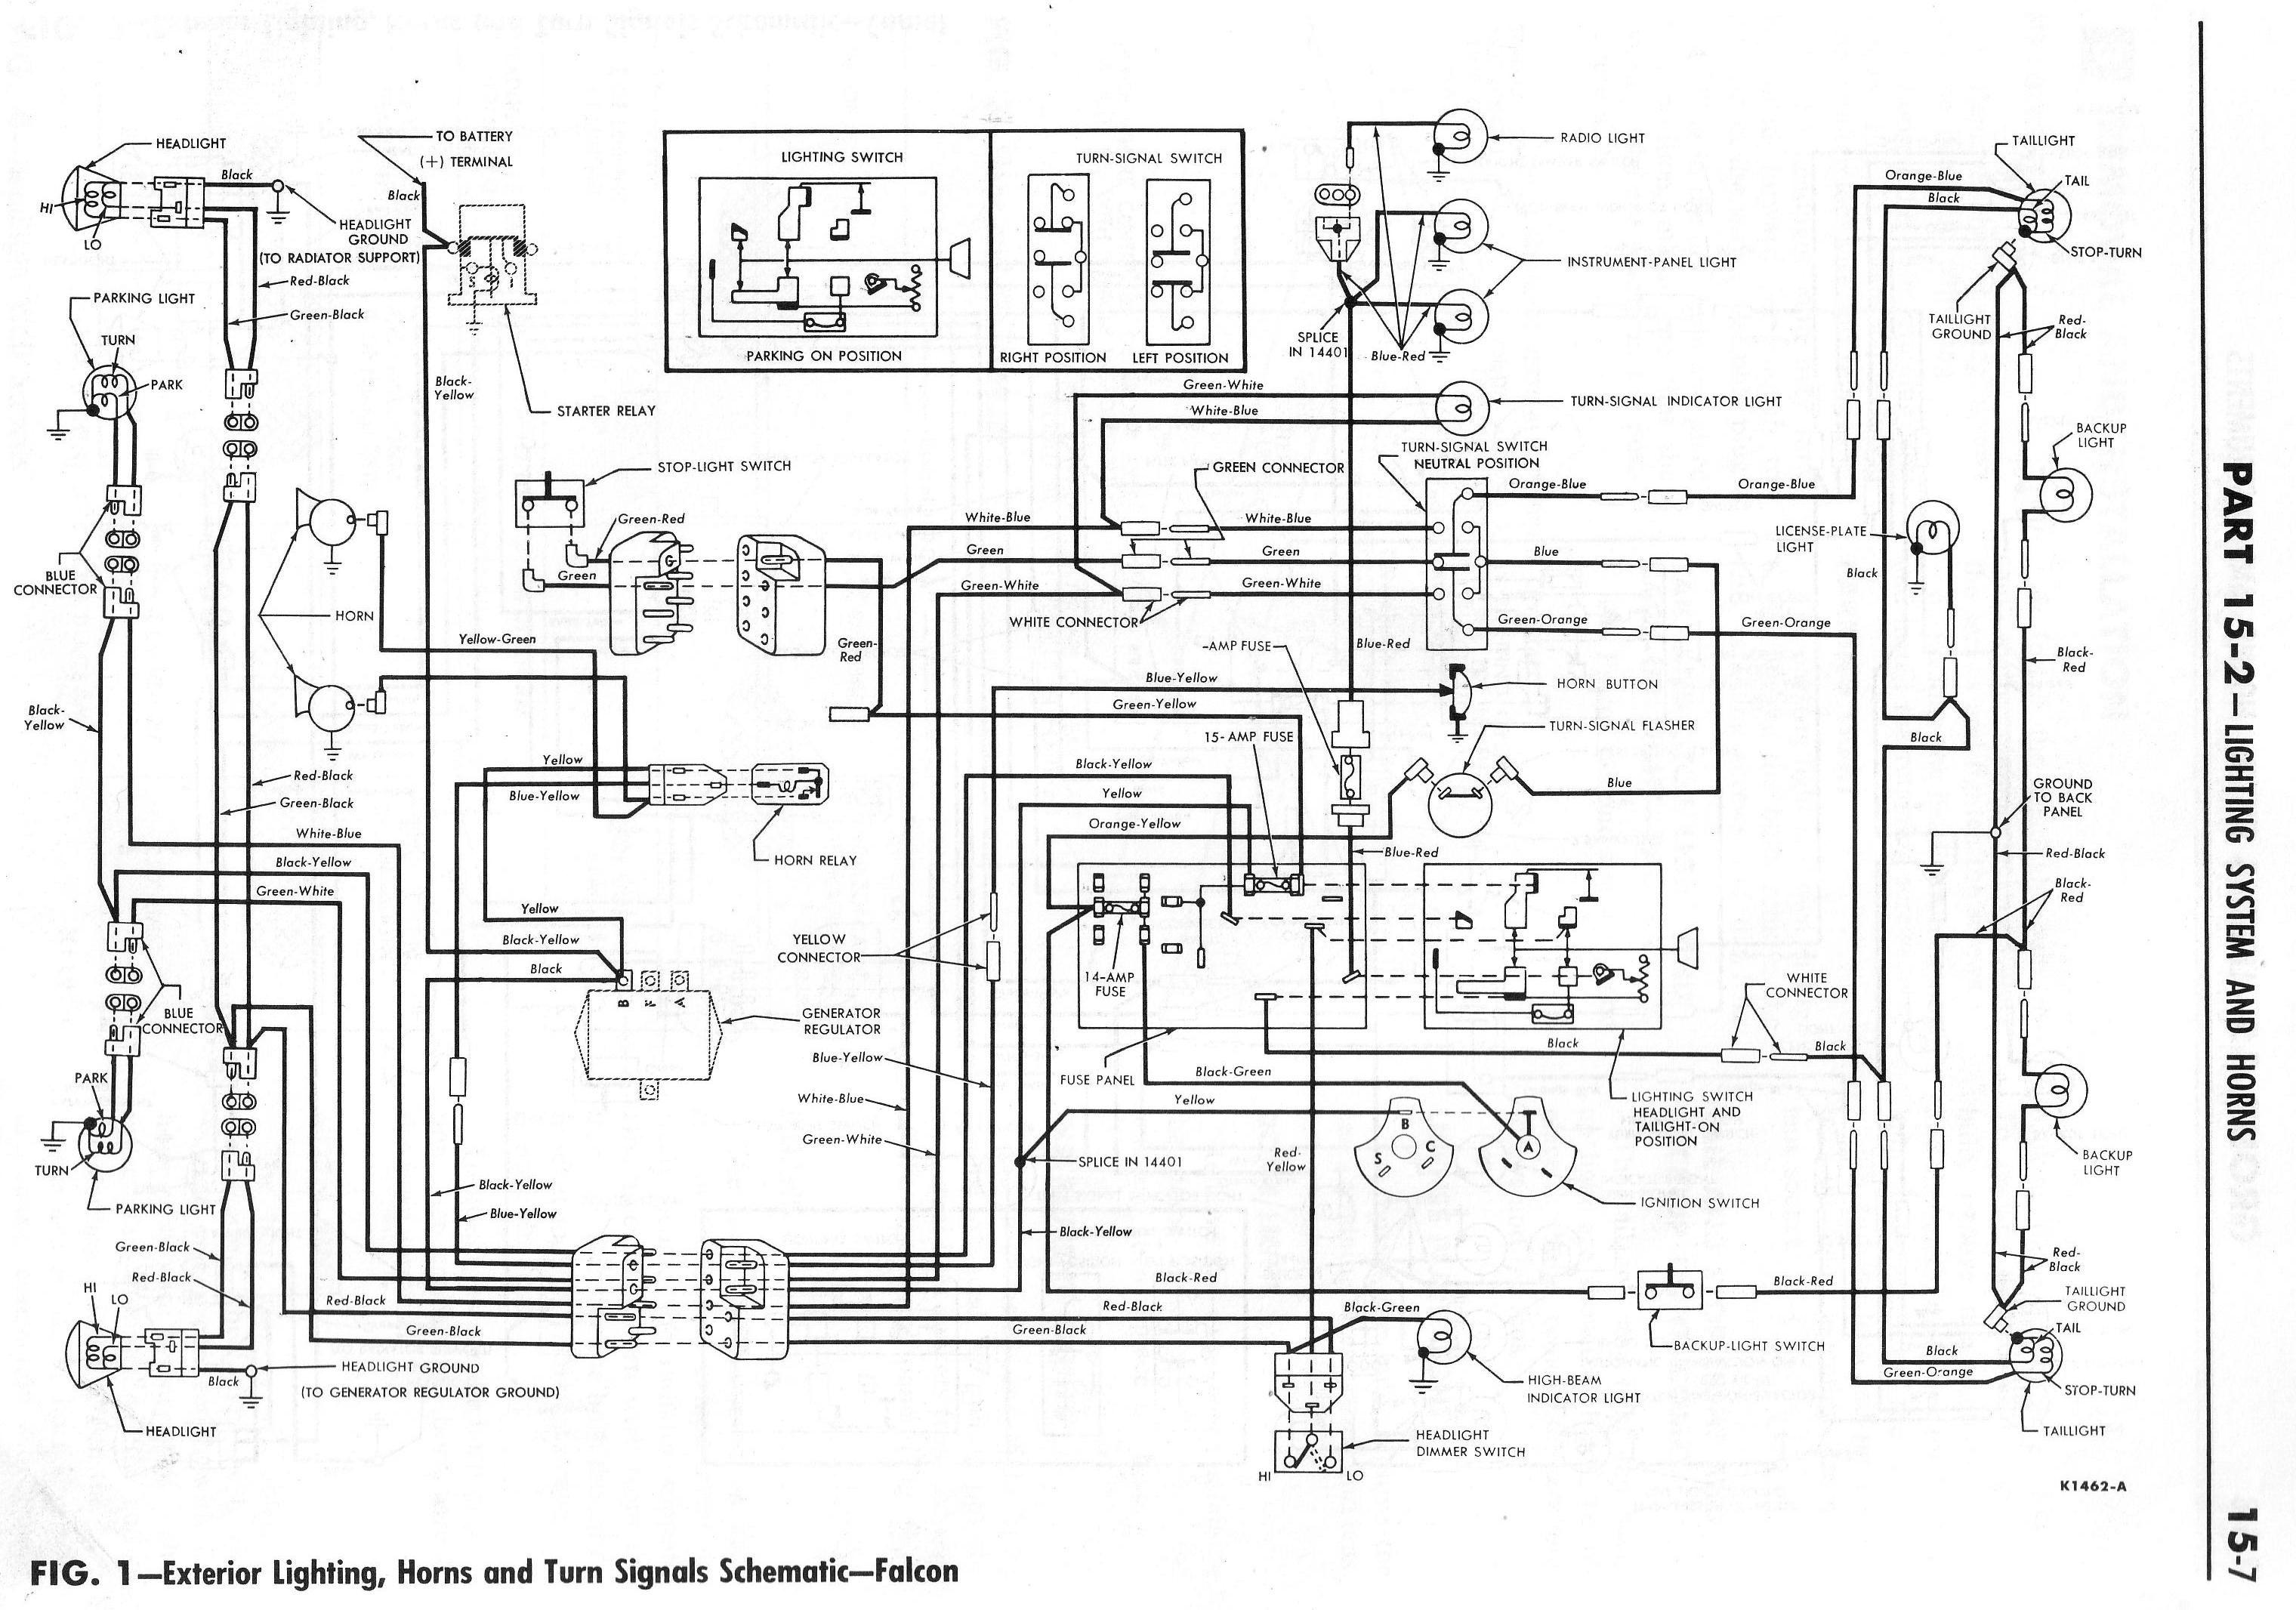 1964 Ranchero Wiring Diagrams   1964 Ranchero Wiring Schematic      Pinterest